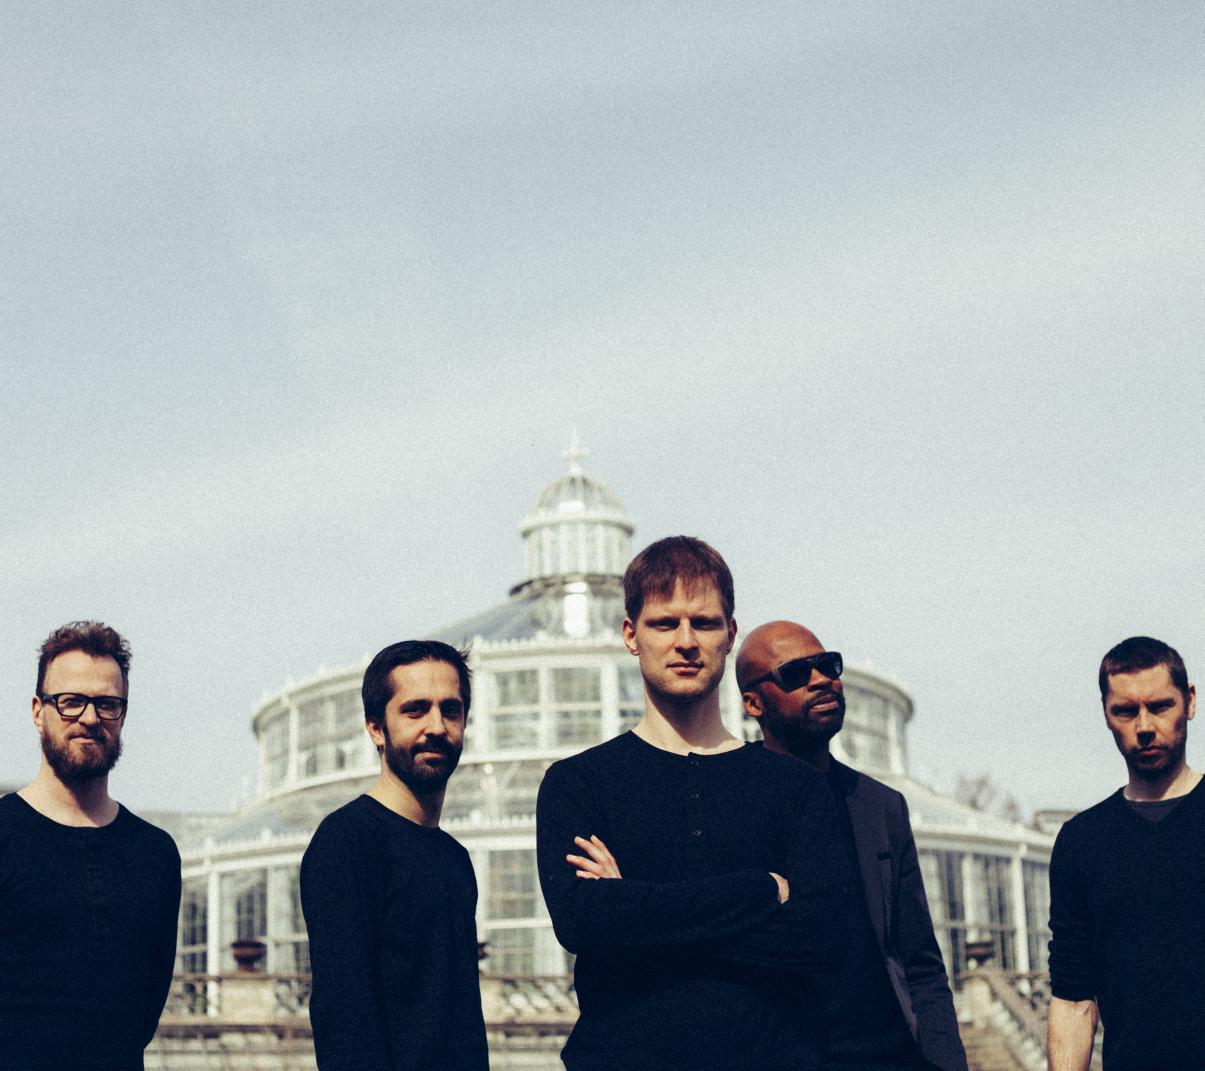 Luboš Soukup Quartet & Lionel Loueke (photo Malwa Grabowska)